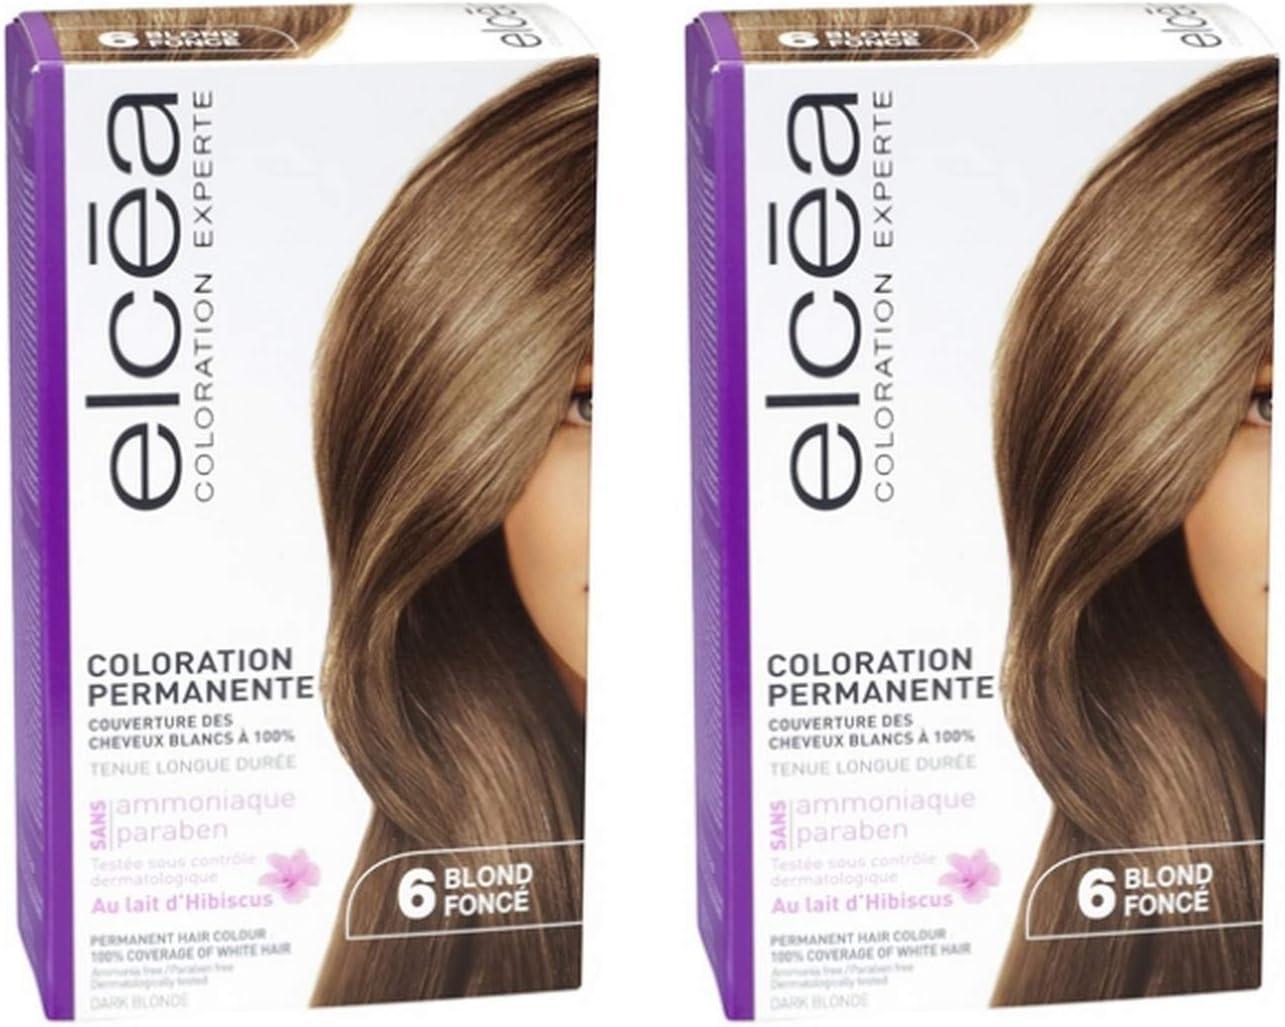 Tinte permanente para cabello Elcea 6 rubio oscuro, lote de 2 ...